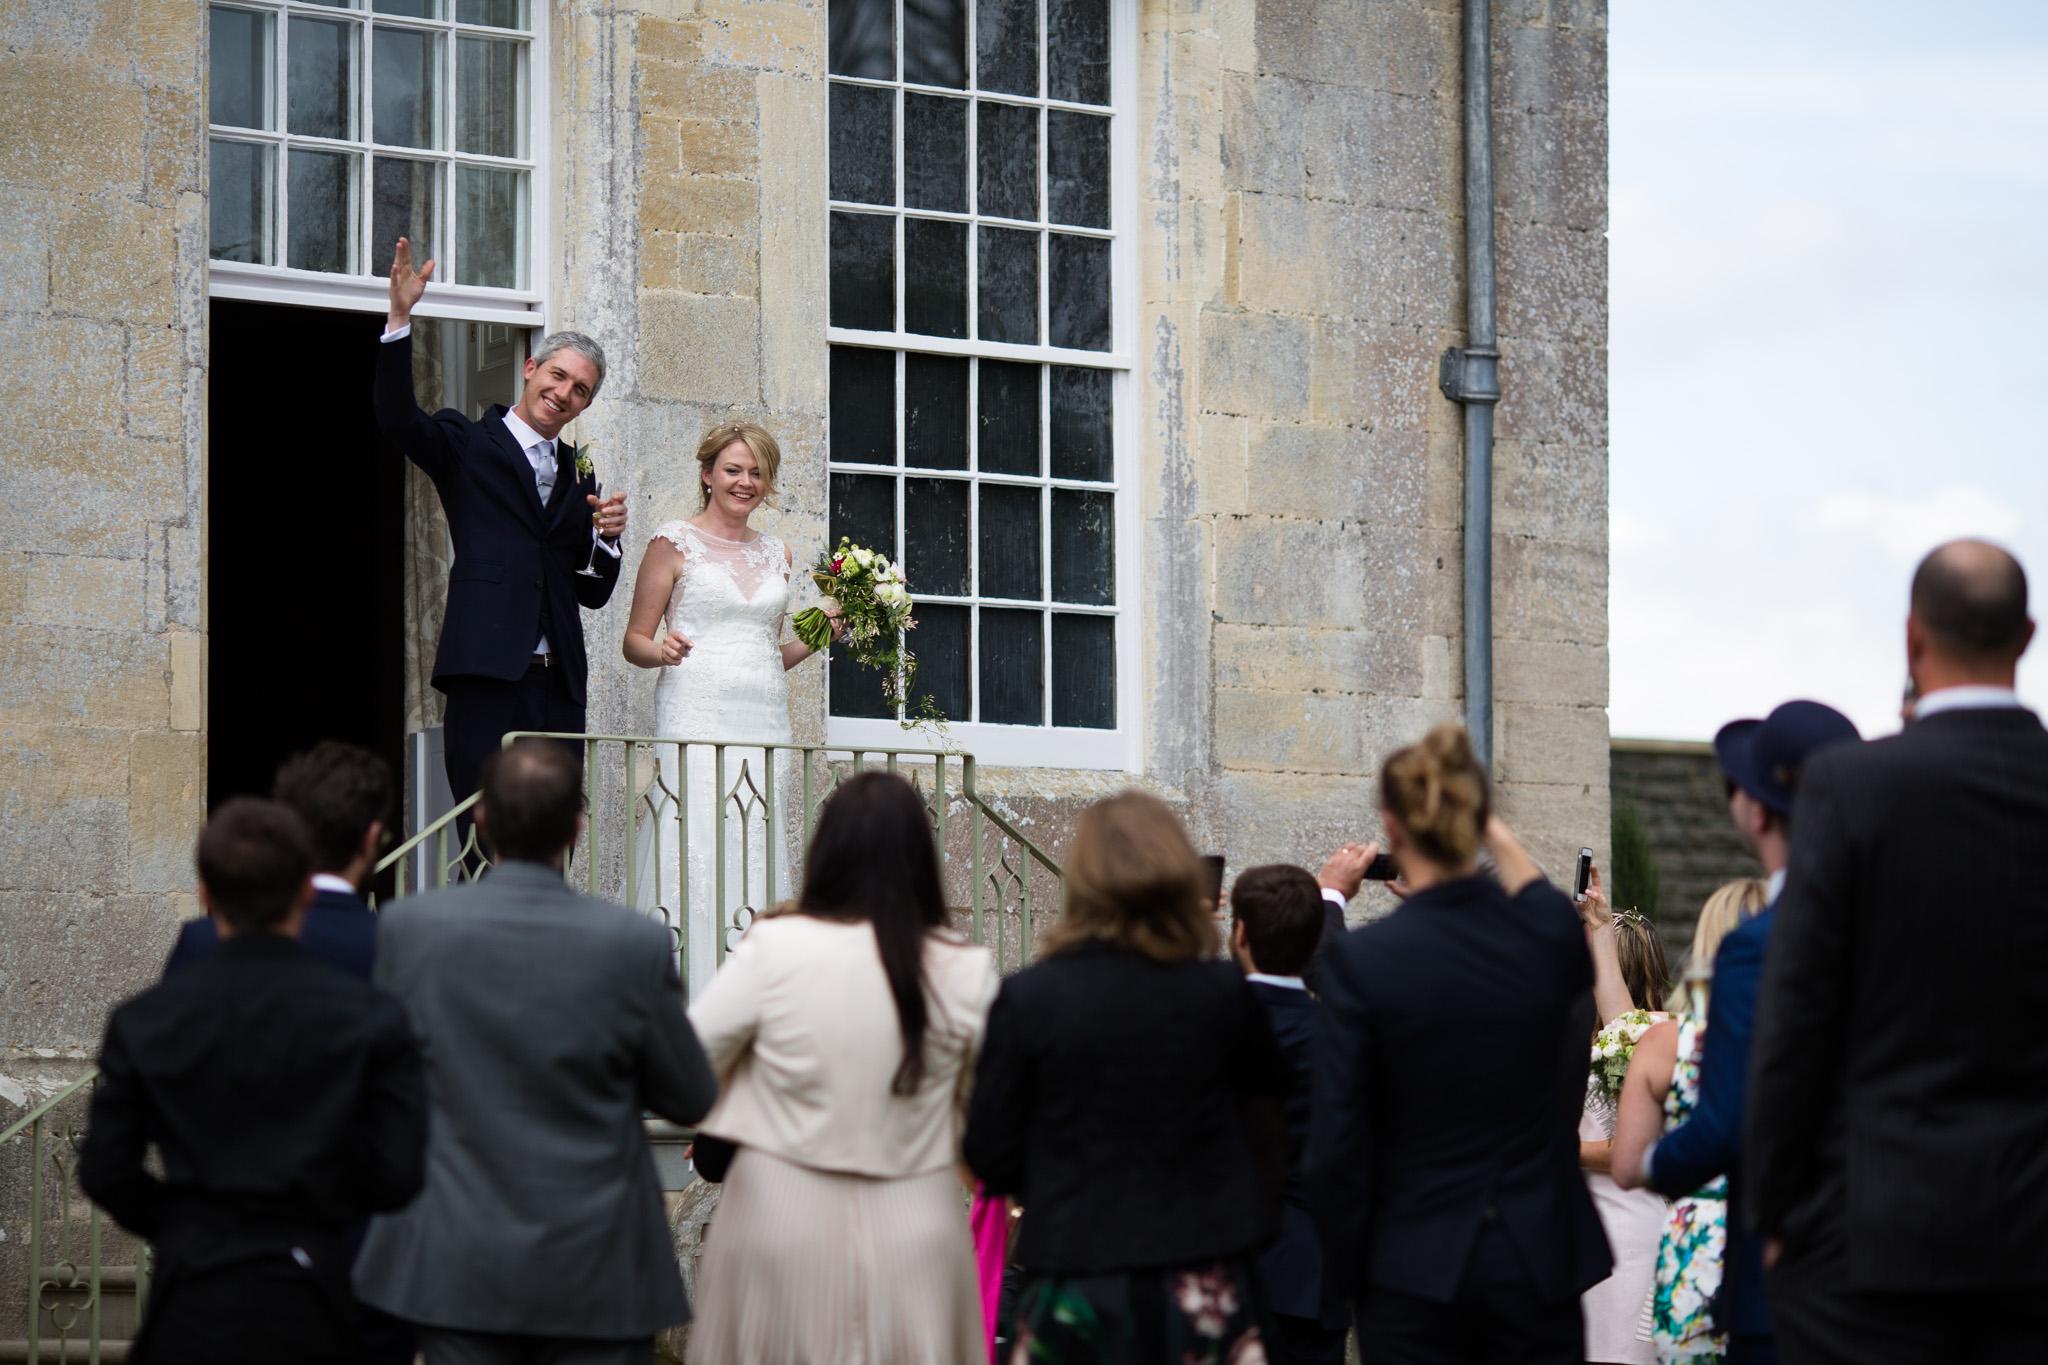 Mark_Barnes_Gloucester_Wedding_Photographer_Elmore_Court_Wedding_Photography_Mike+Kelly-59.jpg